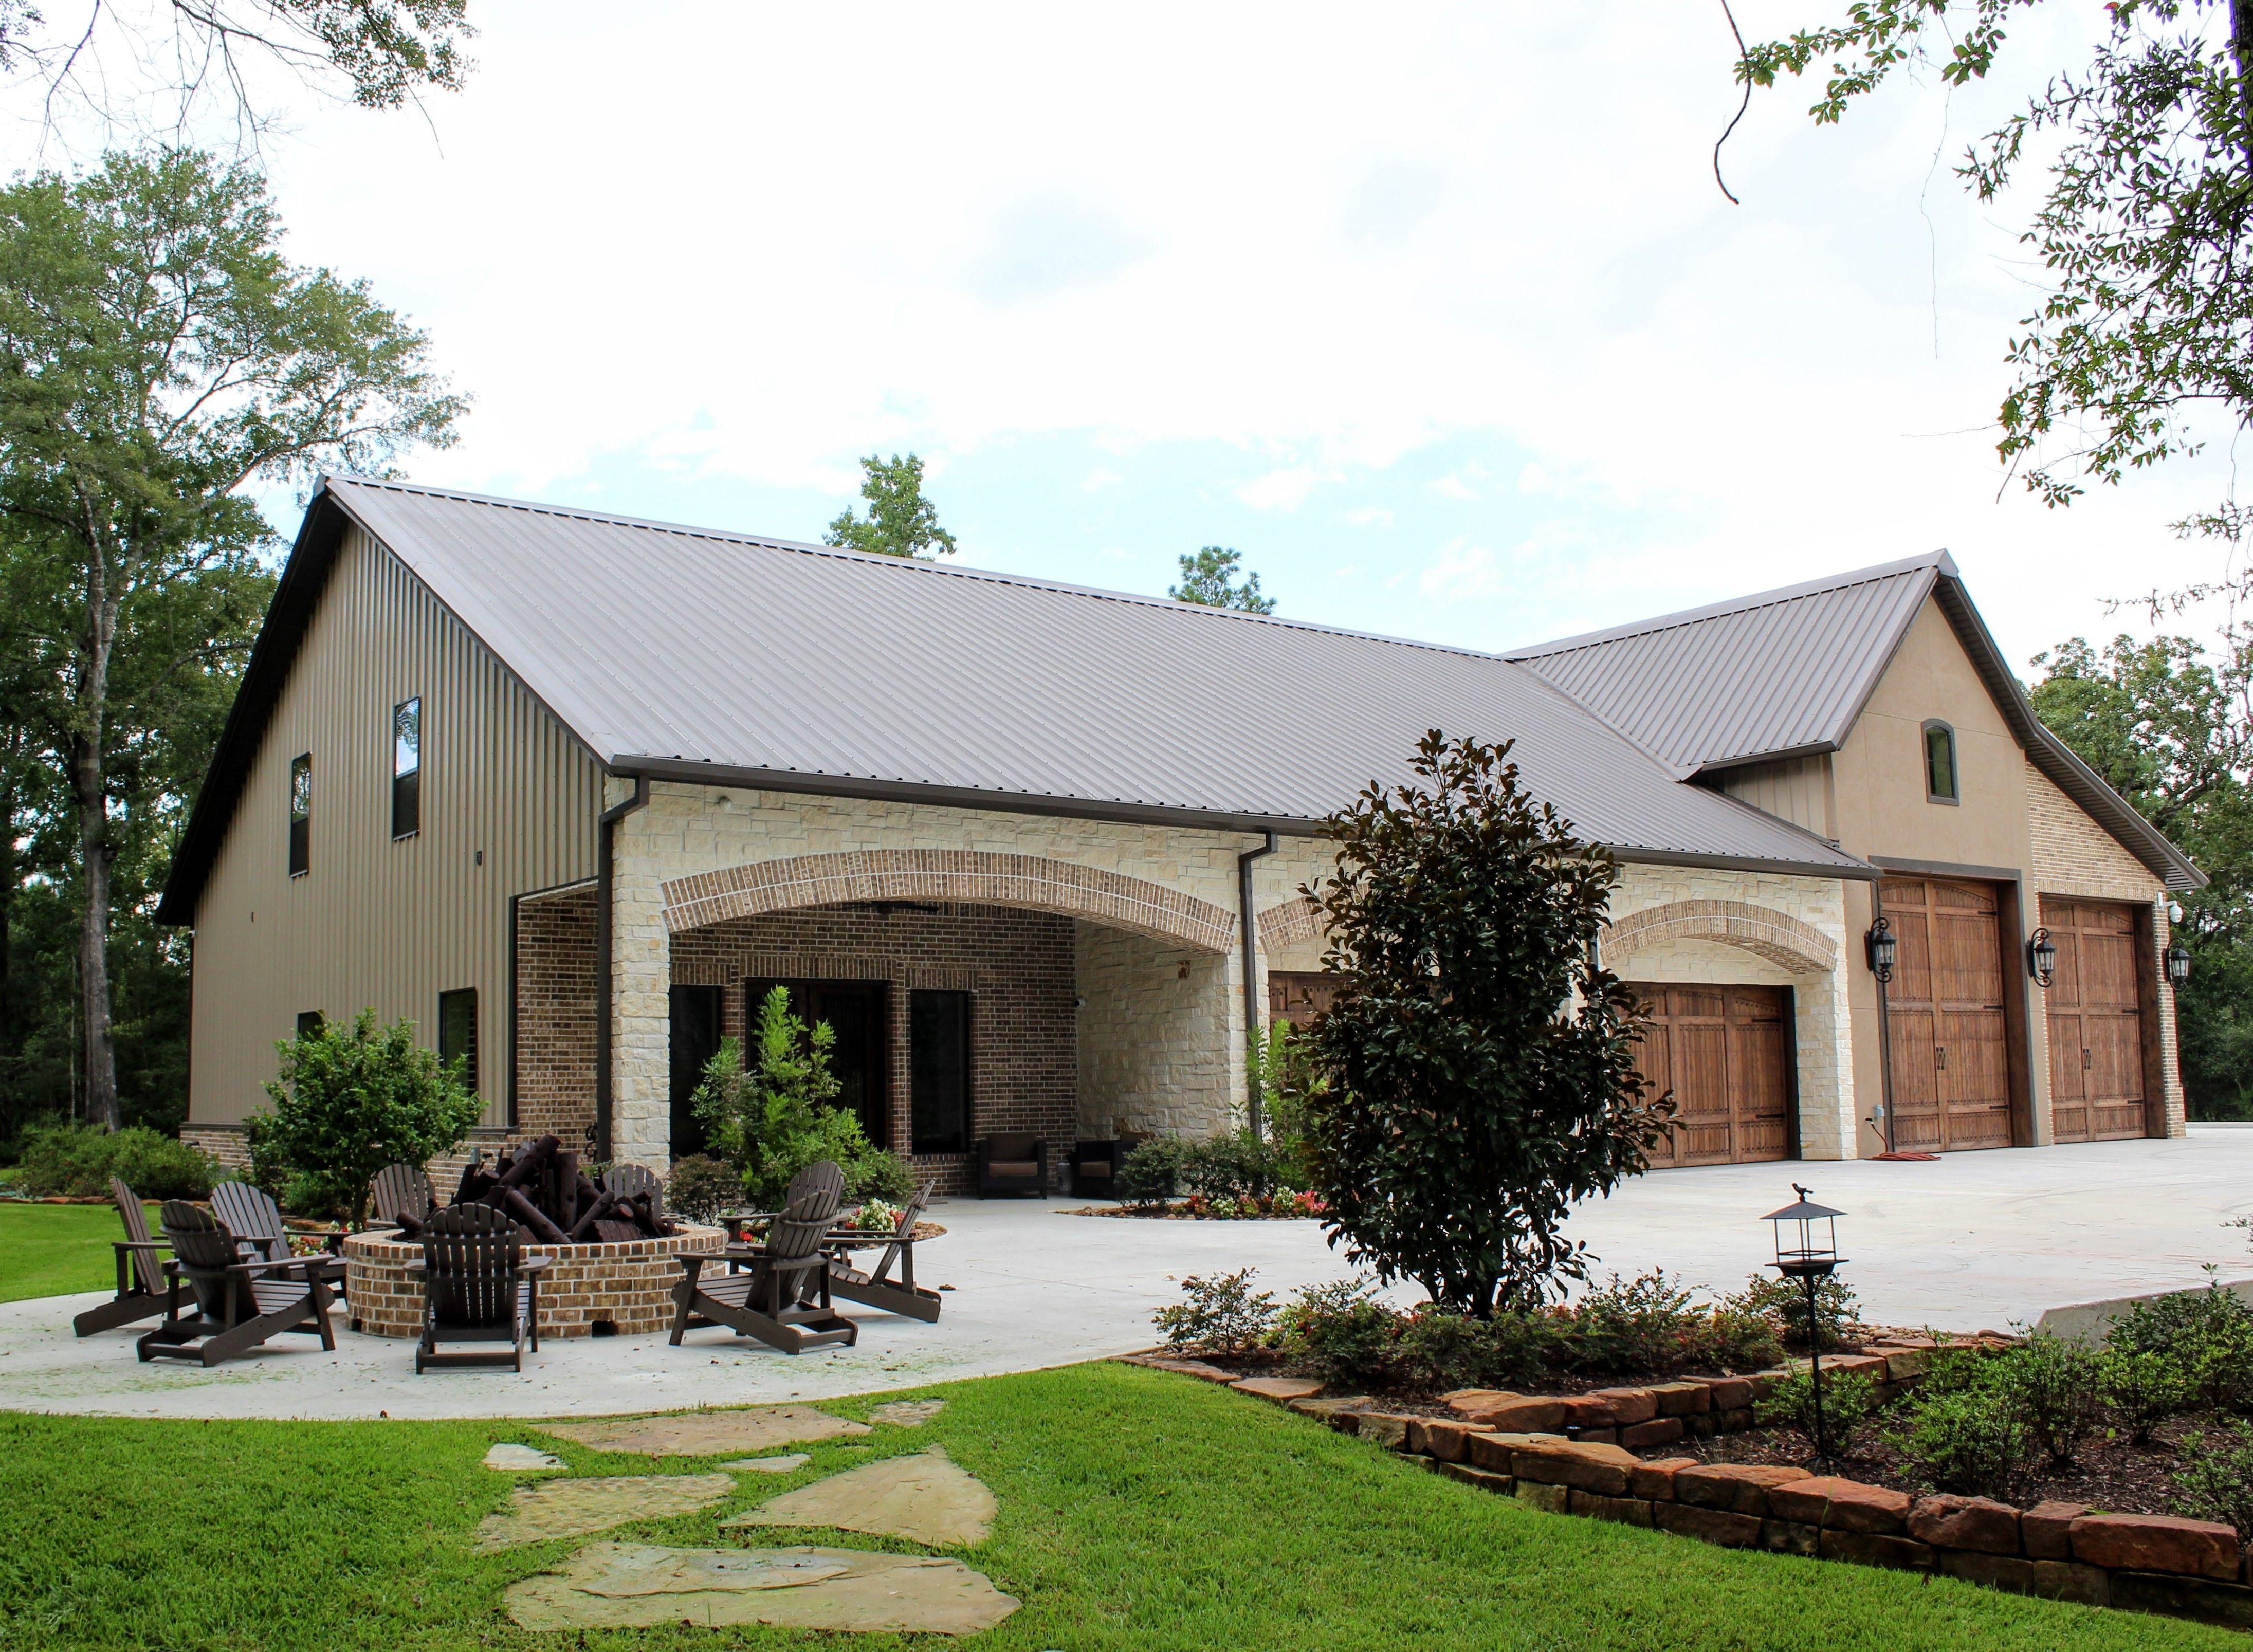 Top 20 Awesome Barndominium Design Ideas In 2020 Pole Barn House Plans Barn House Plans Metal Barn Homes